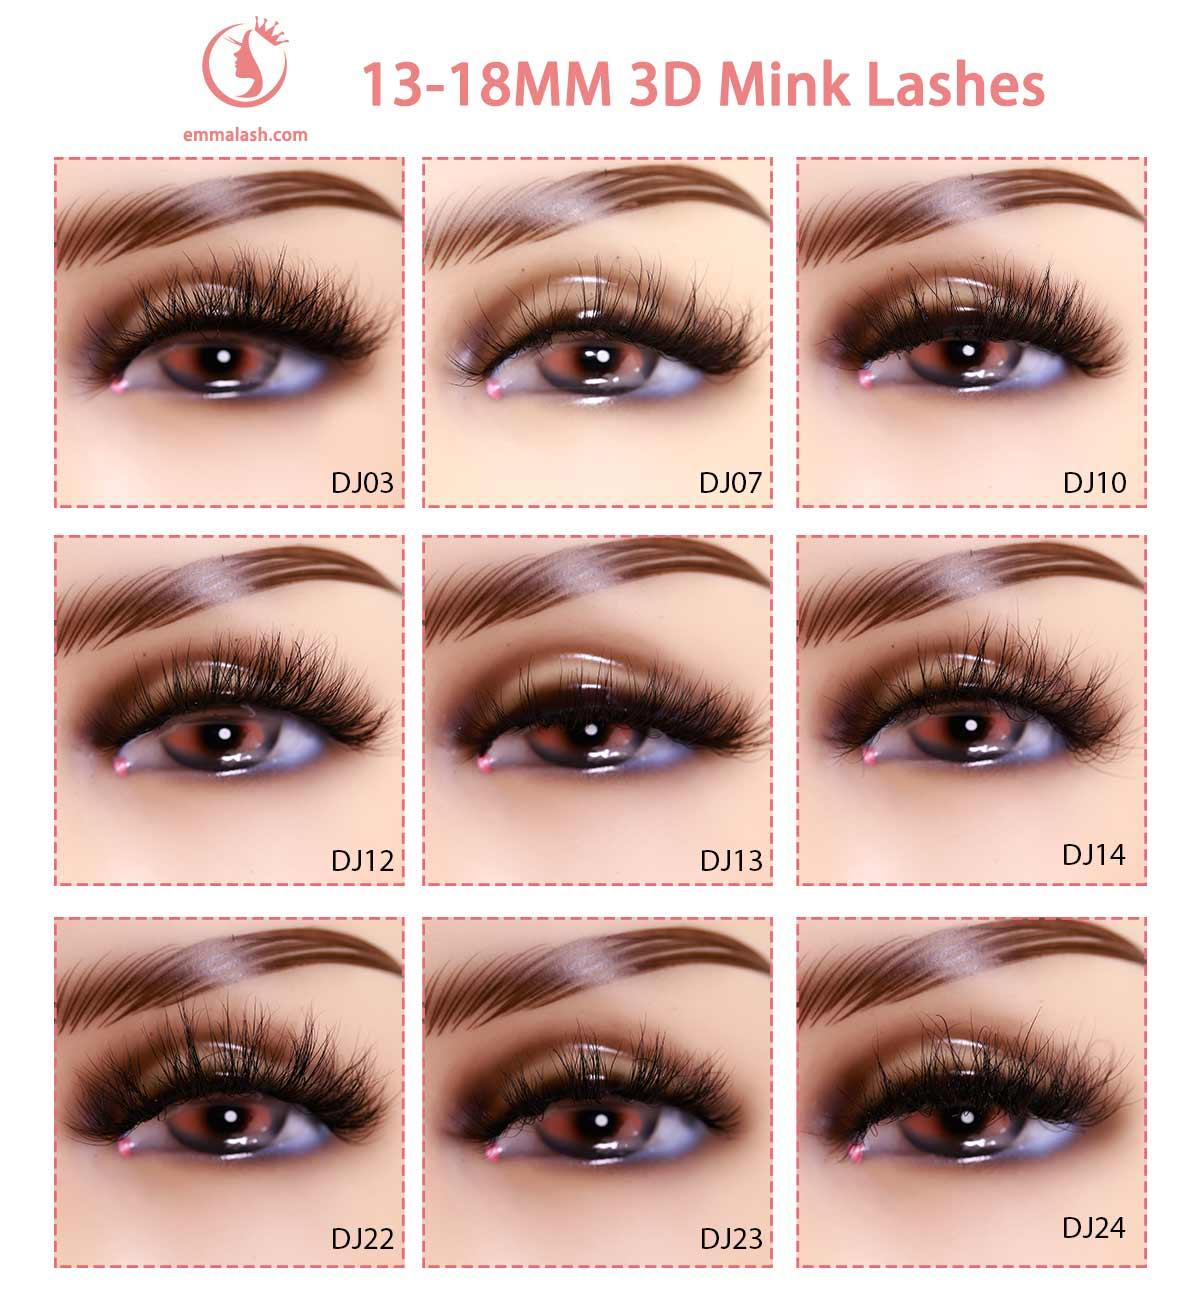 wholesale mink lashes Model 18mm 3